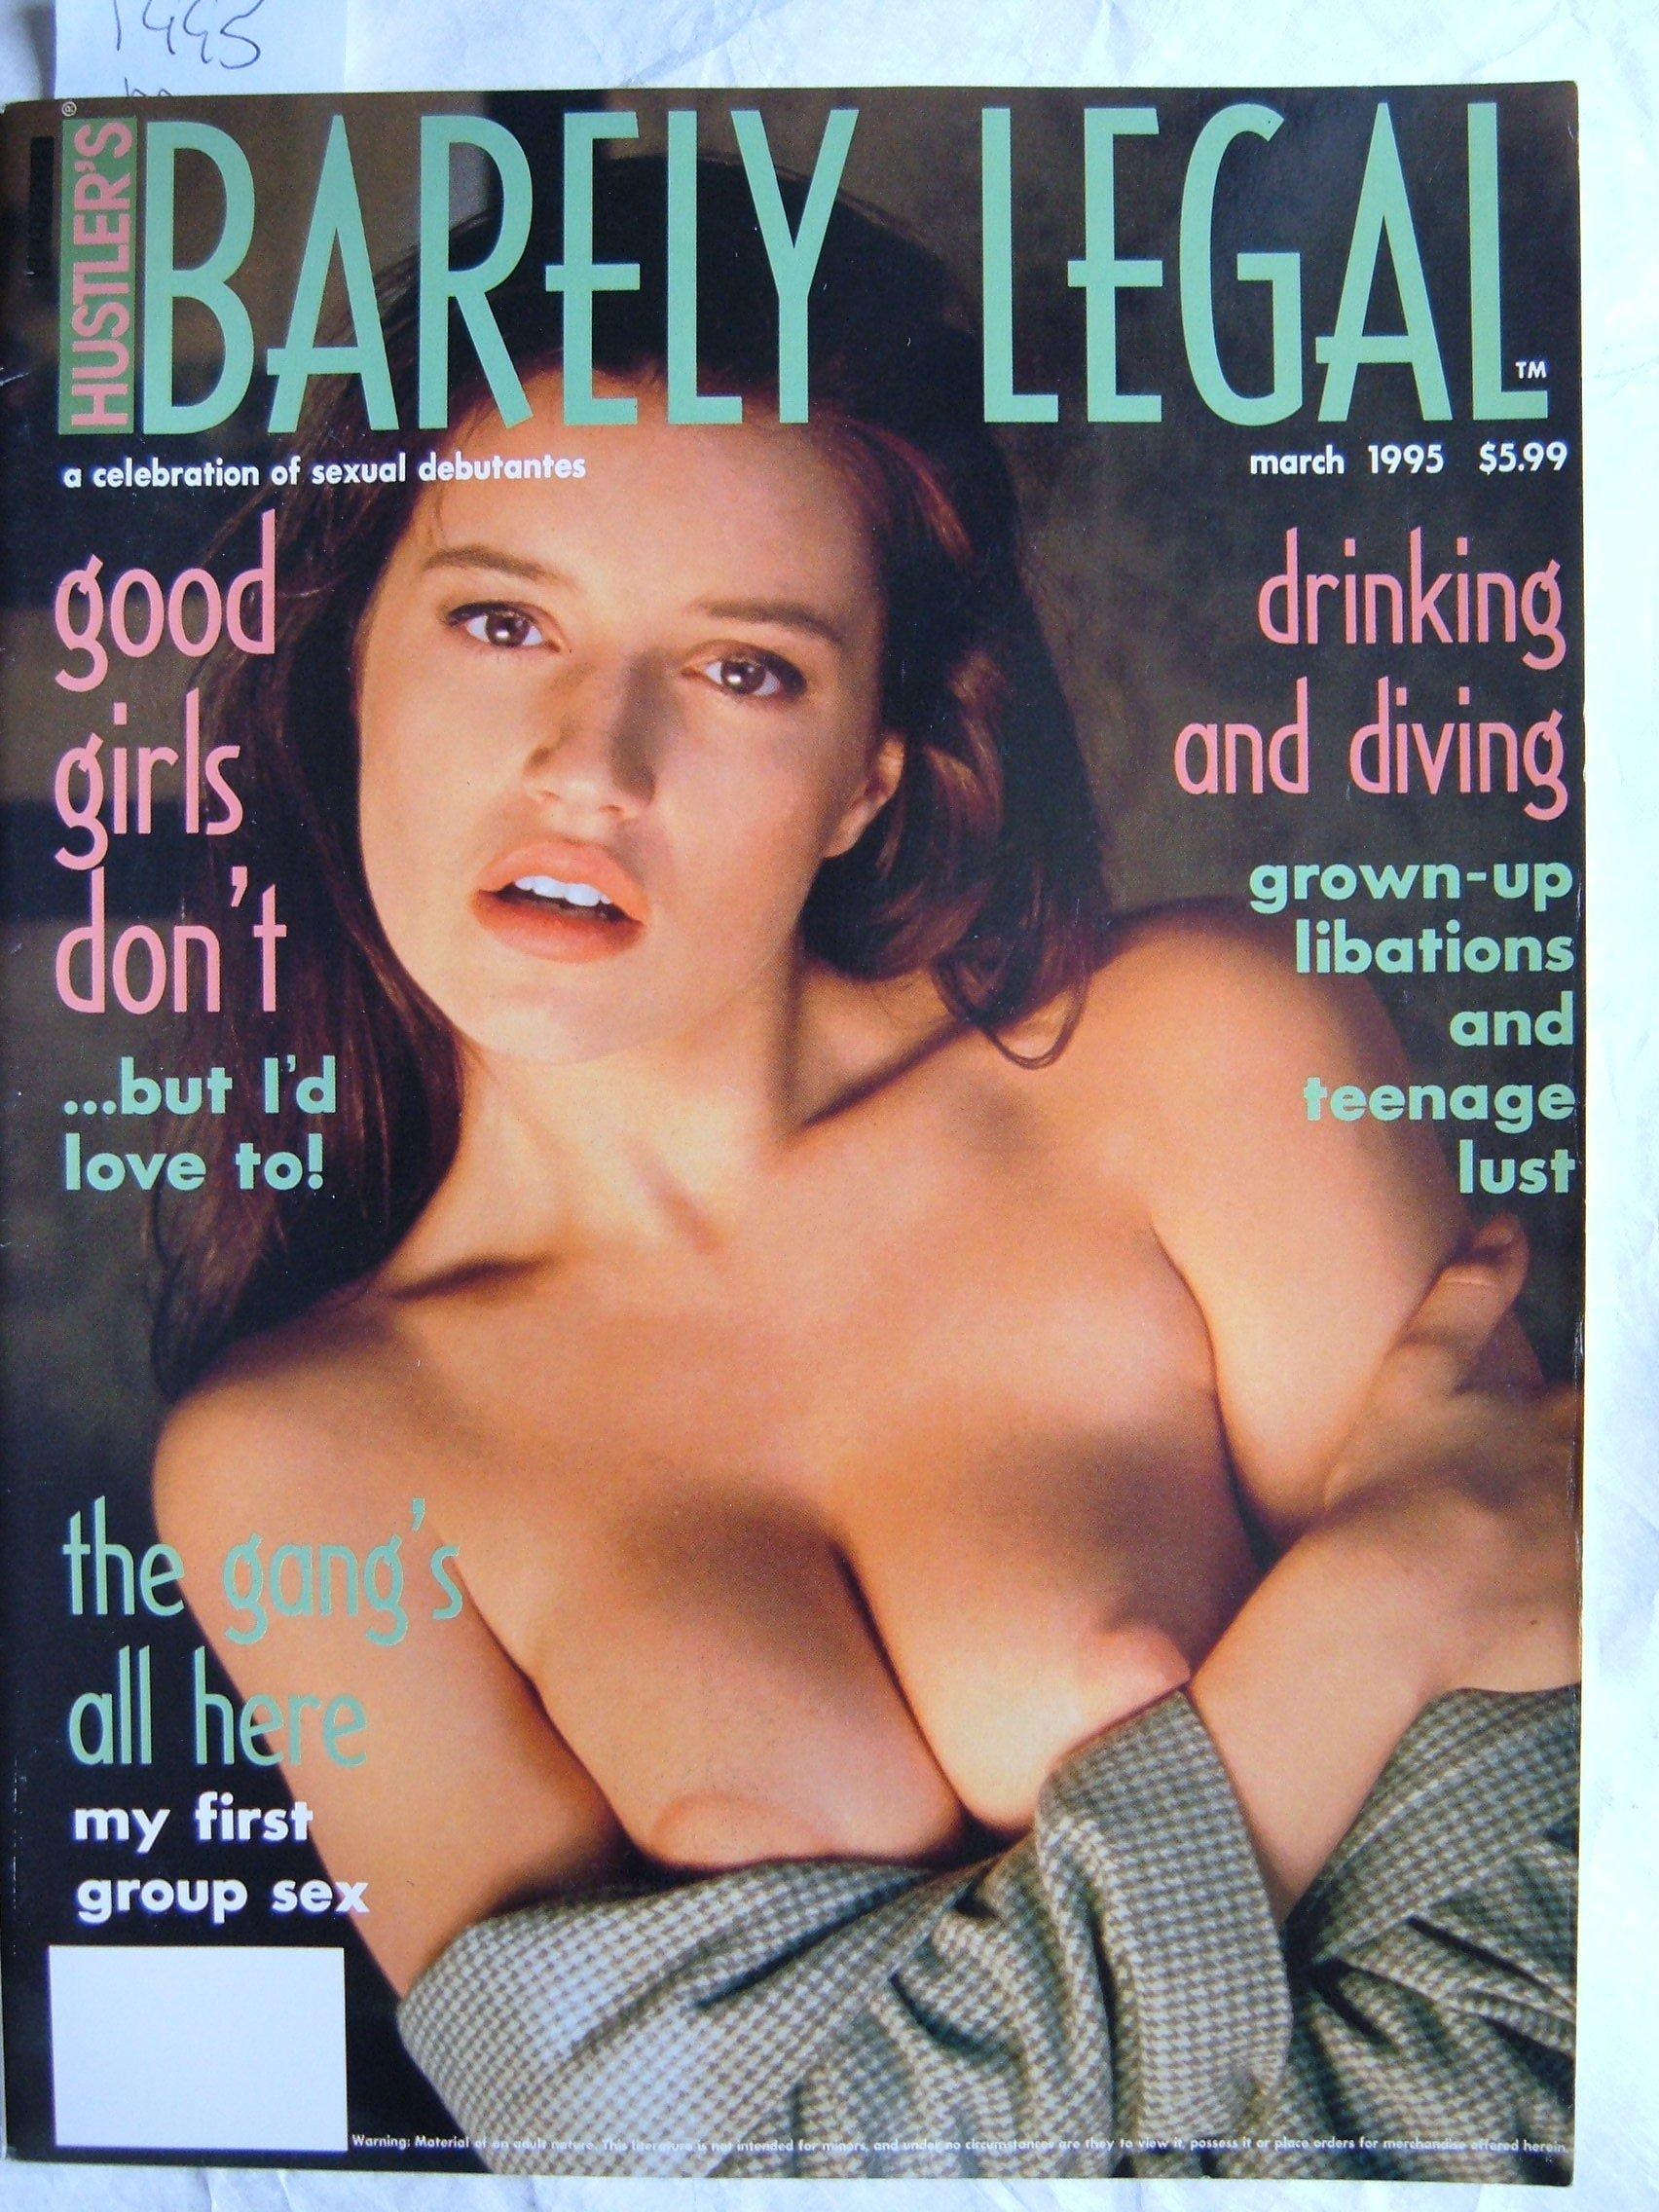 Barely legal magazine girls